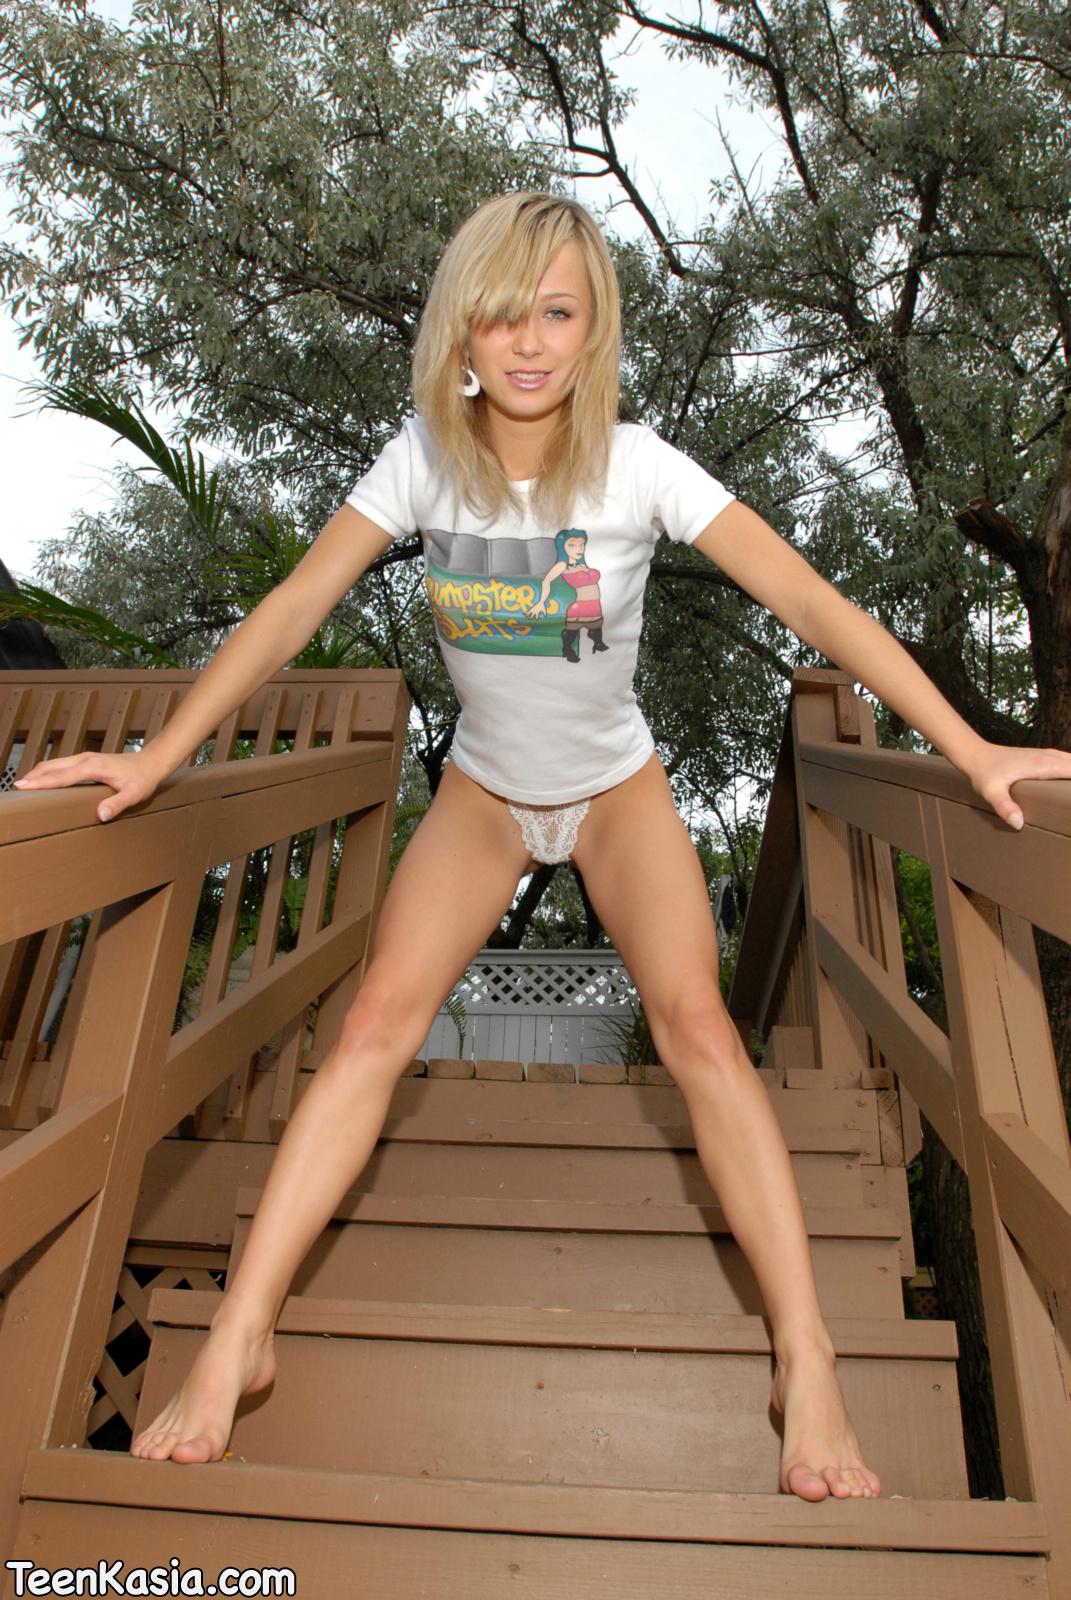 Teen Füße Schlampen Fotos #15